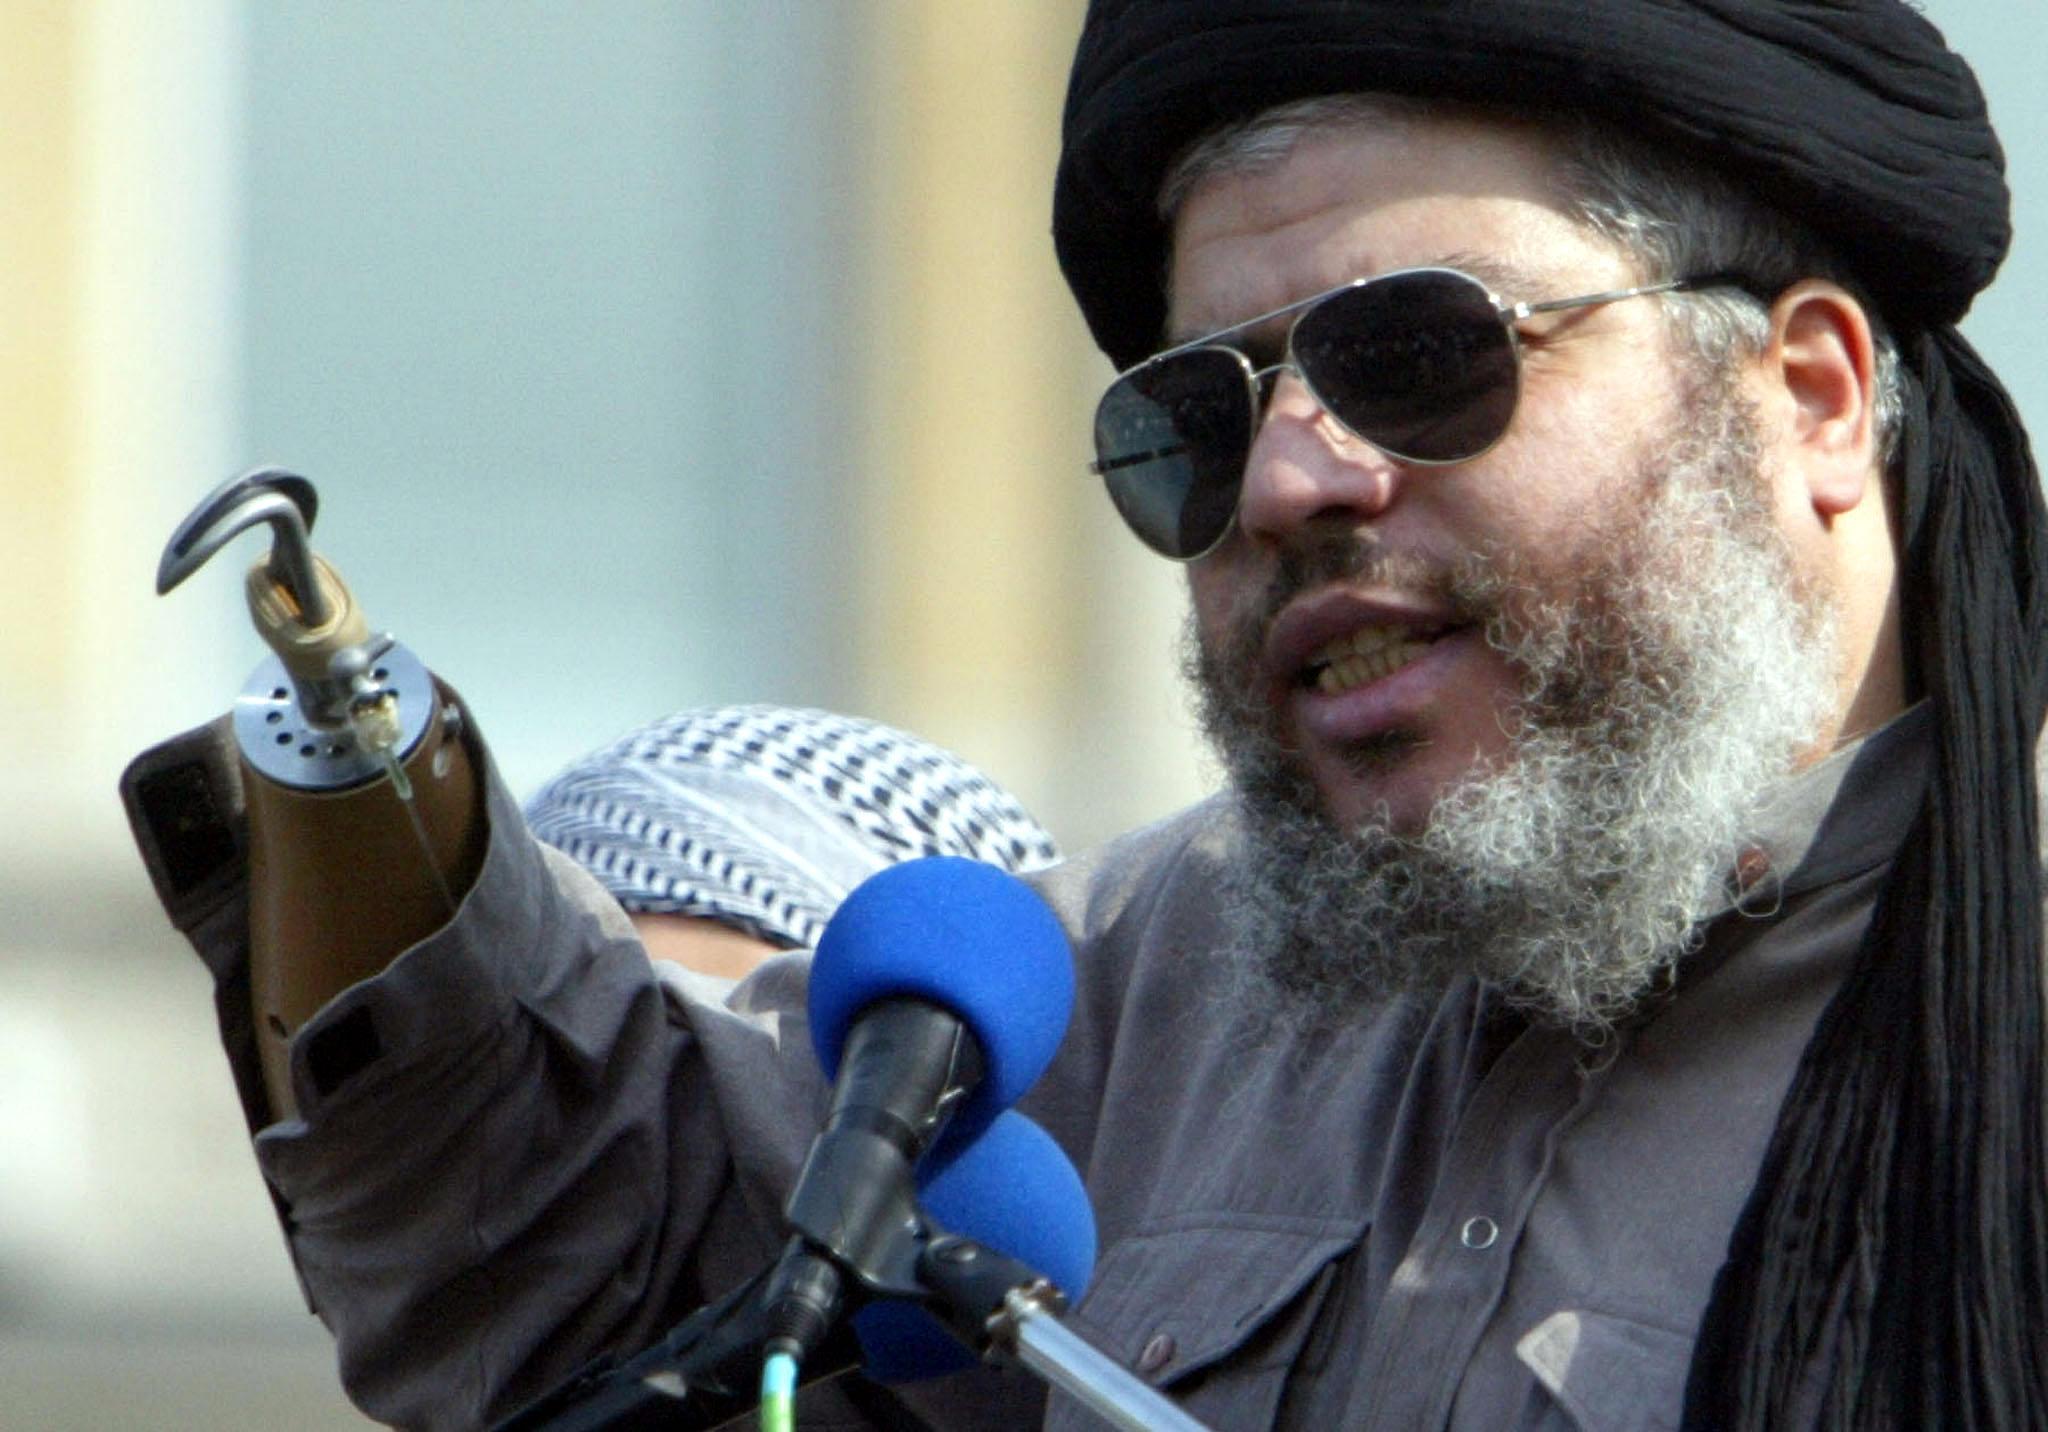 Radical Islamist cleric Abu Hamza al-Masri addresses an                   annual rally for Islam in Trafalgar Square, London, on Aug. 25, 2002